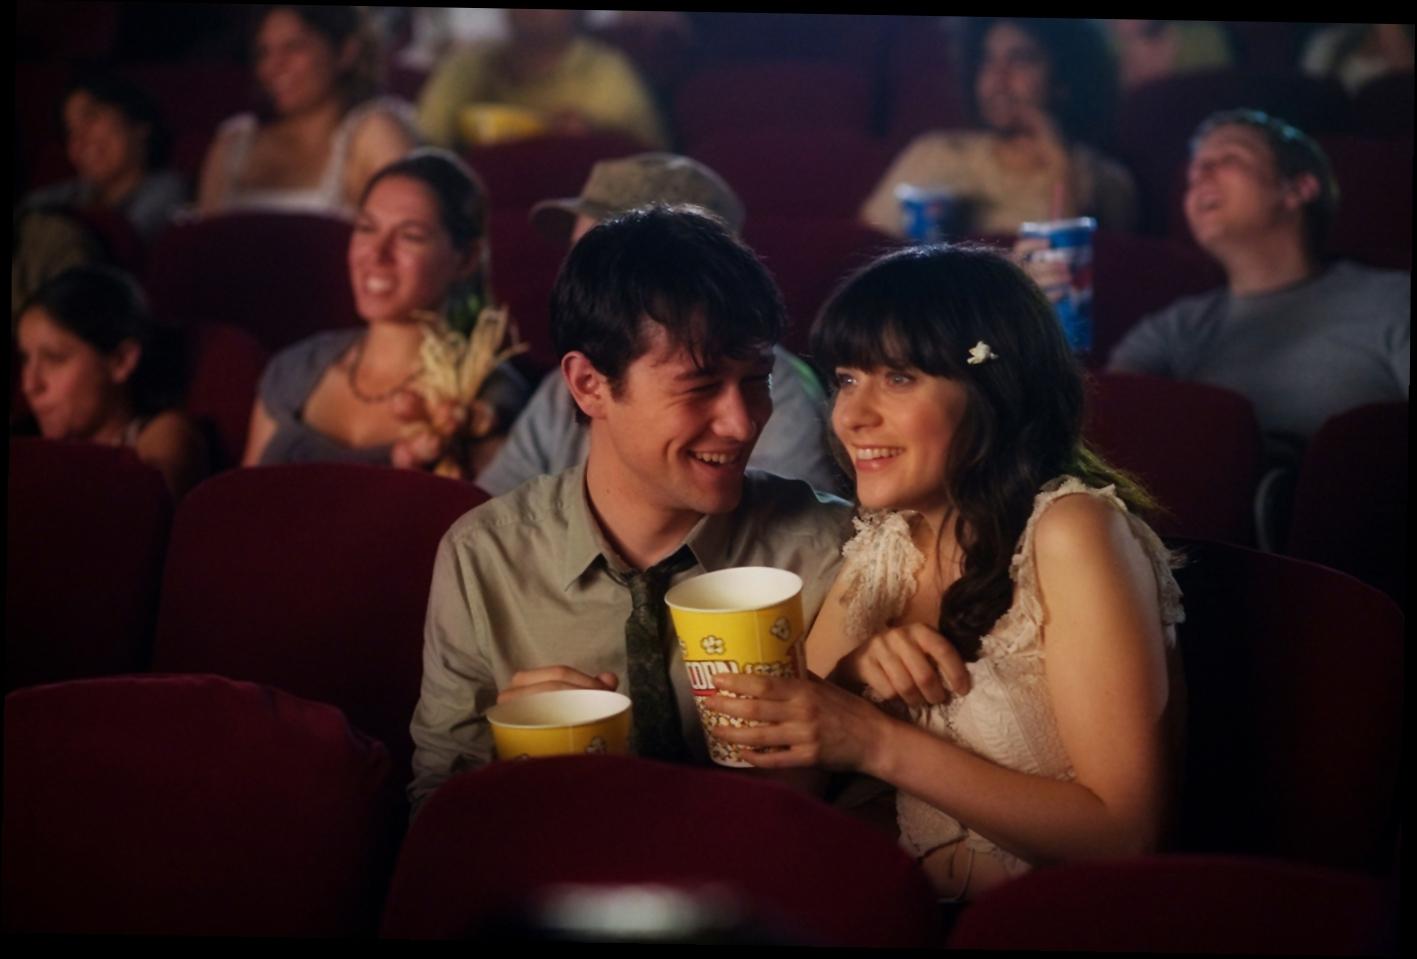 сцены смотреть пары